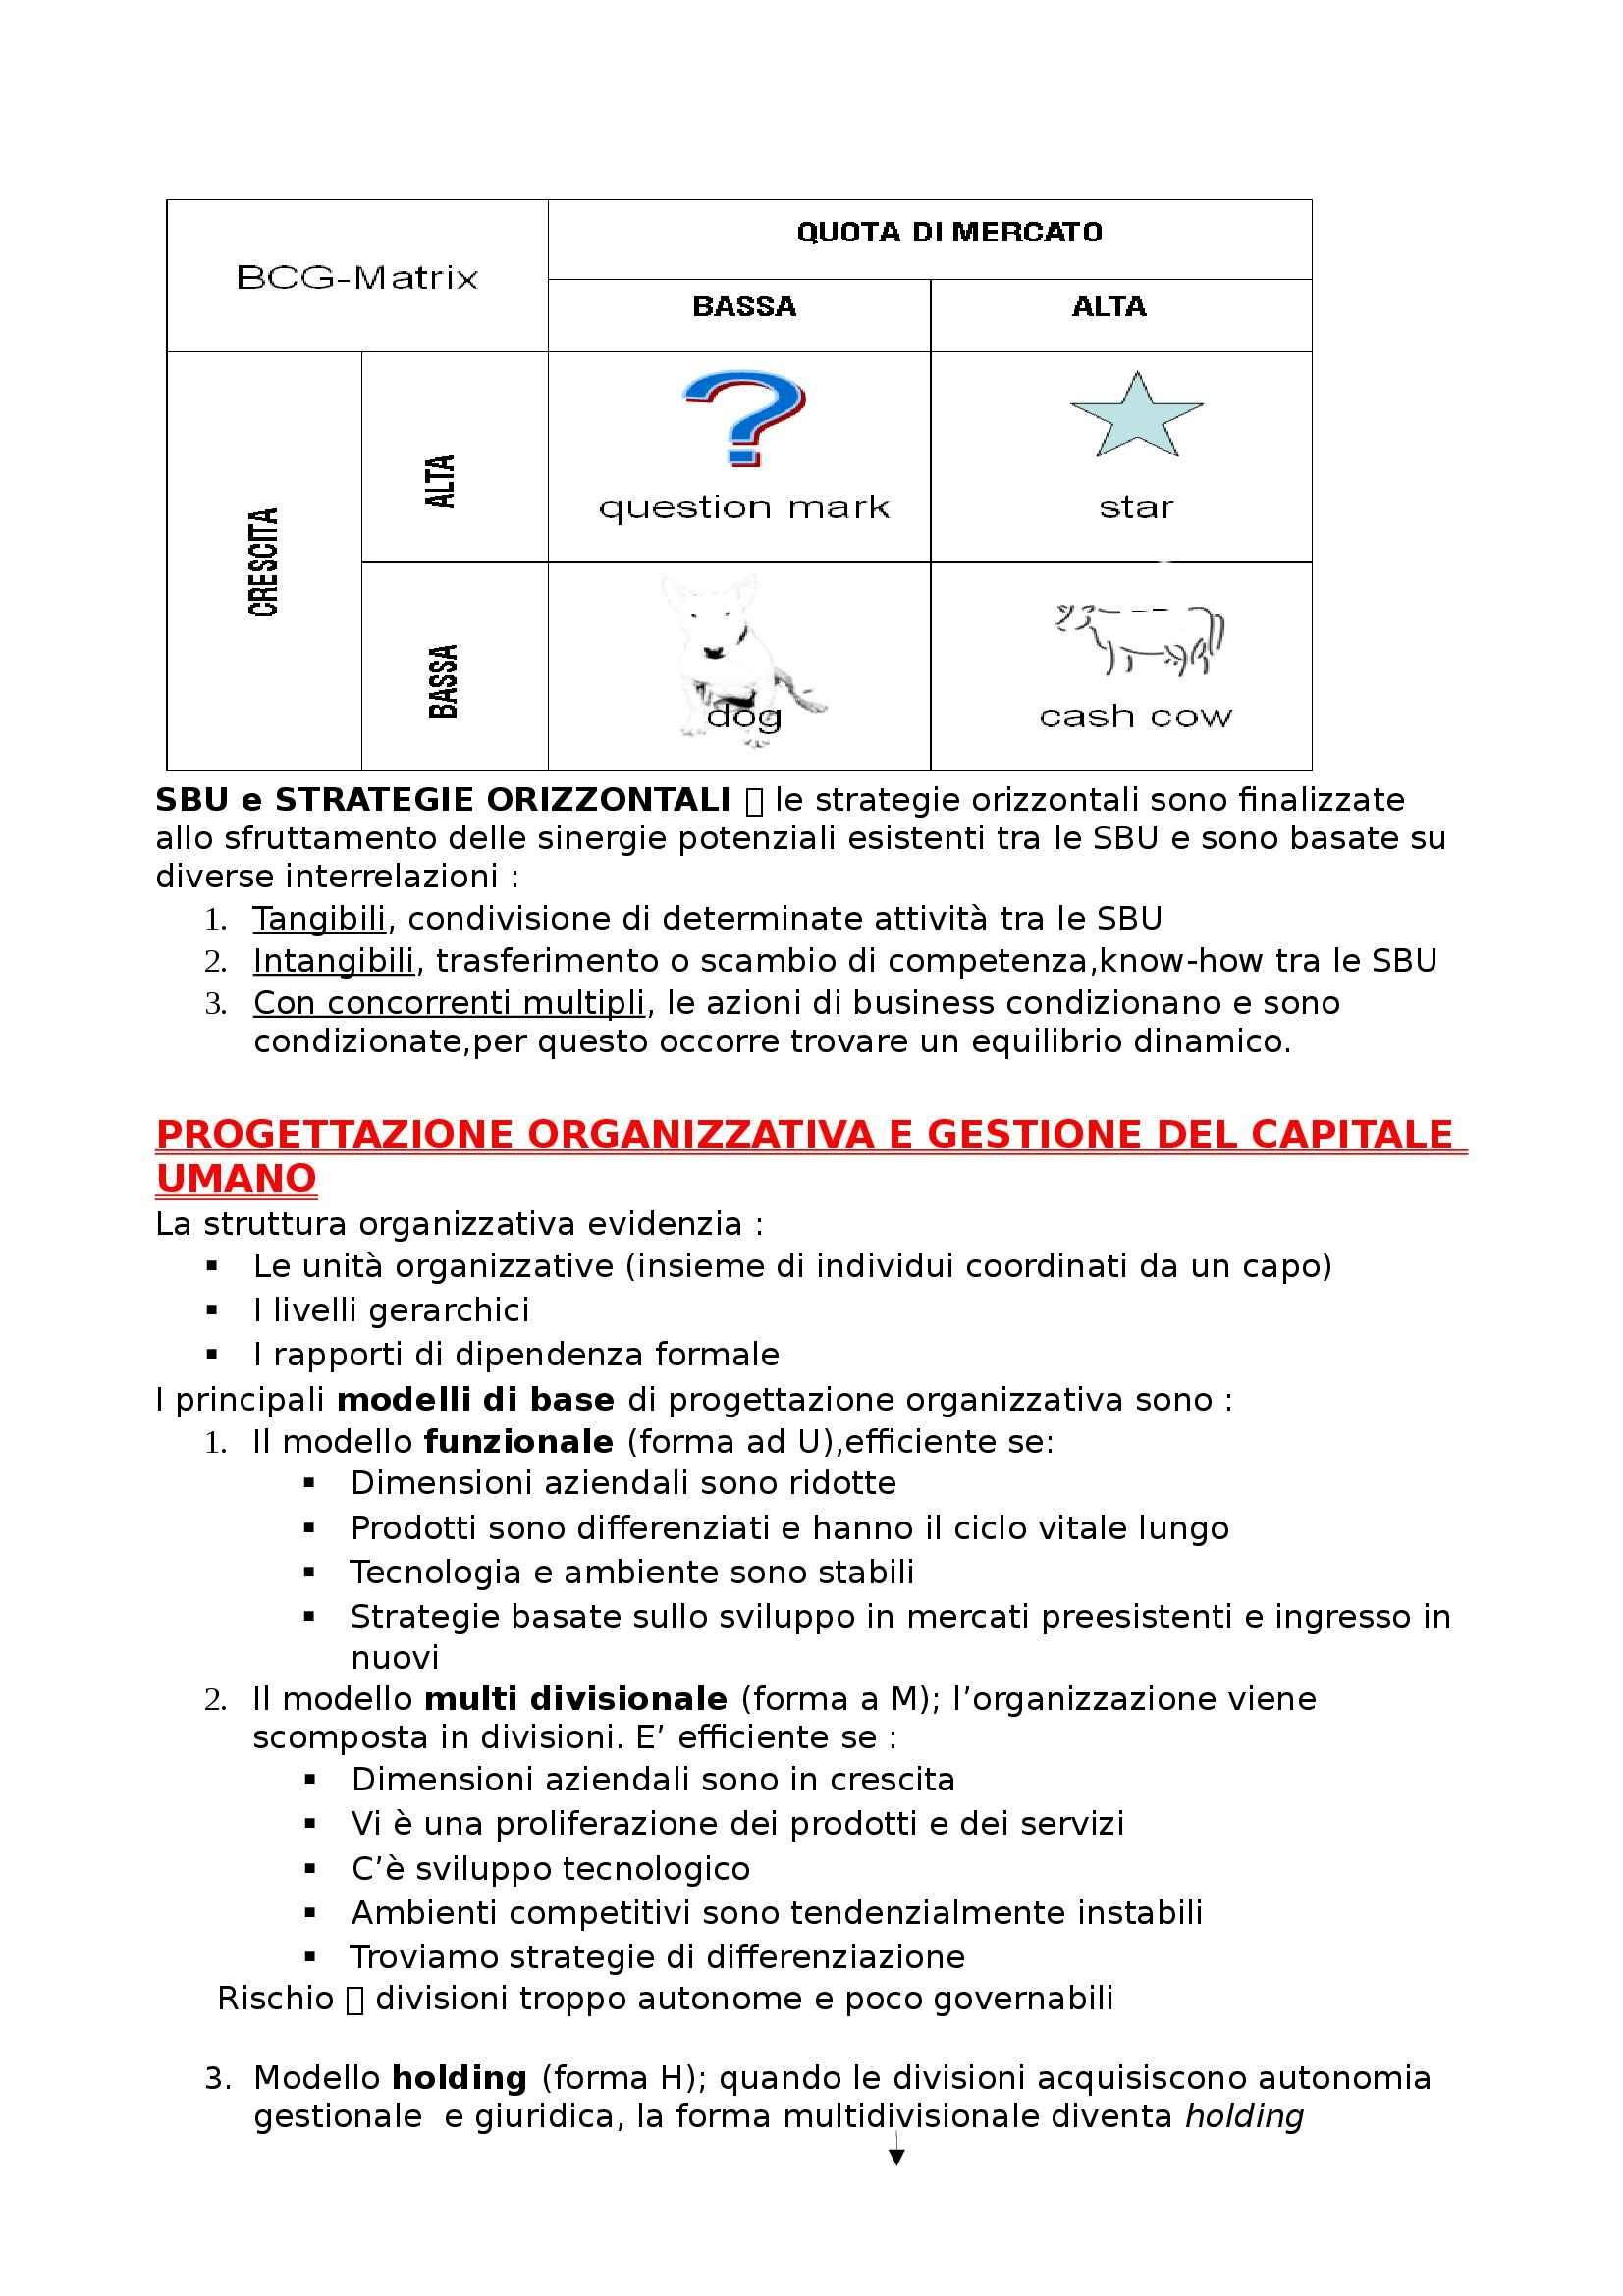 Fondamenti di management - management Pag. 16